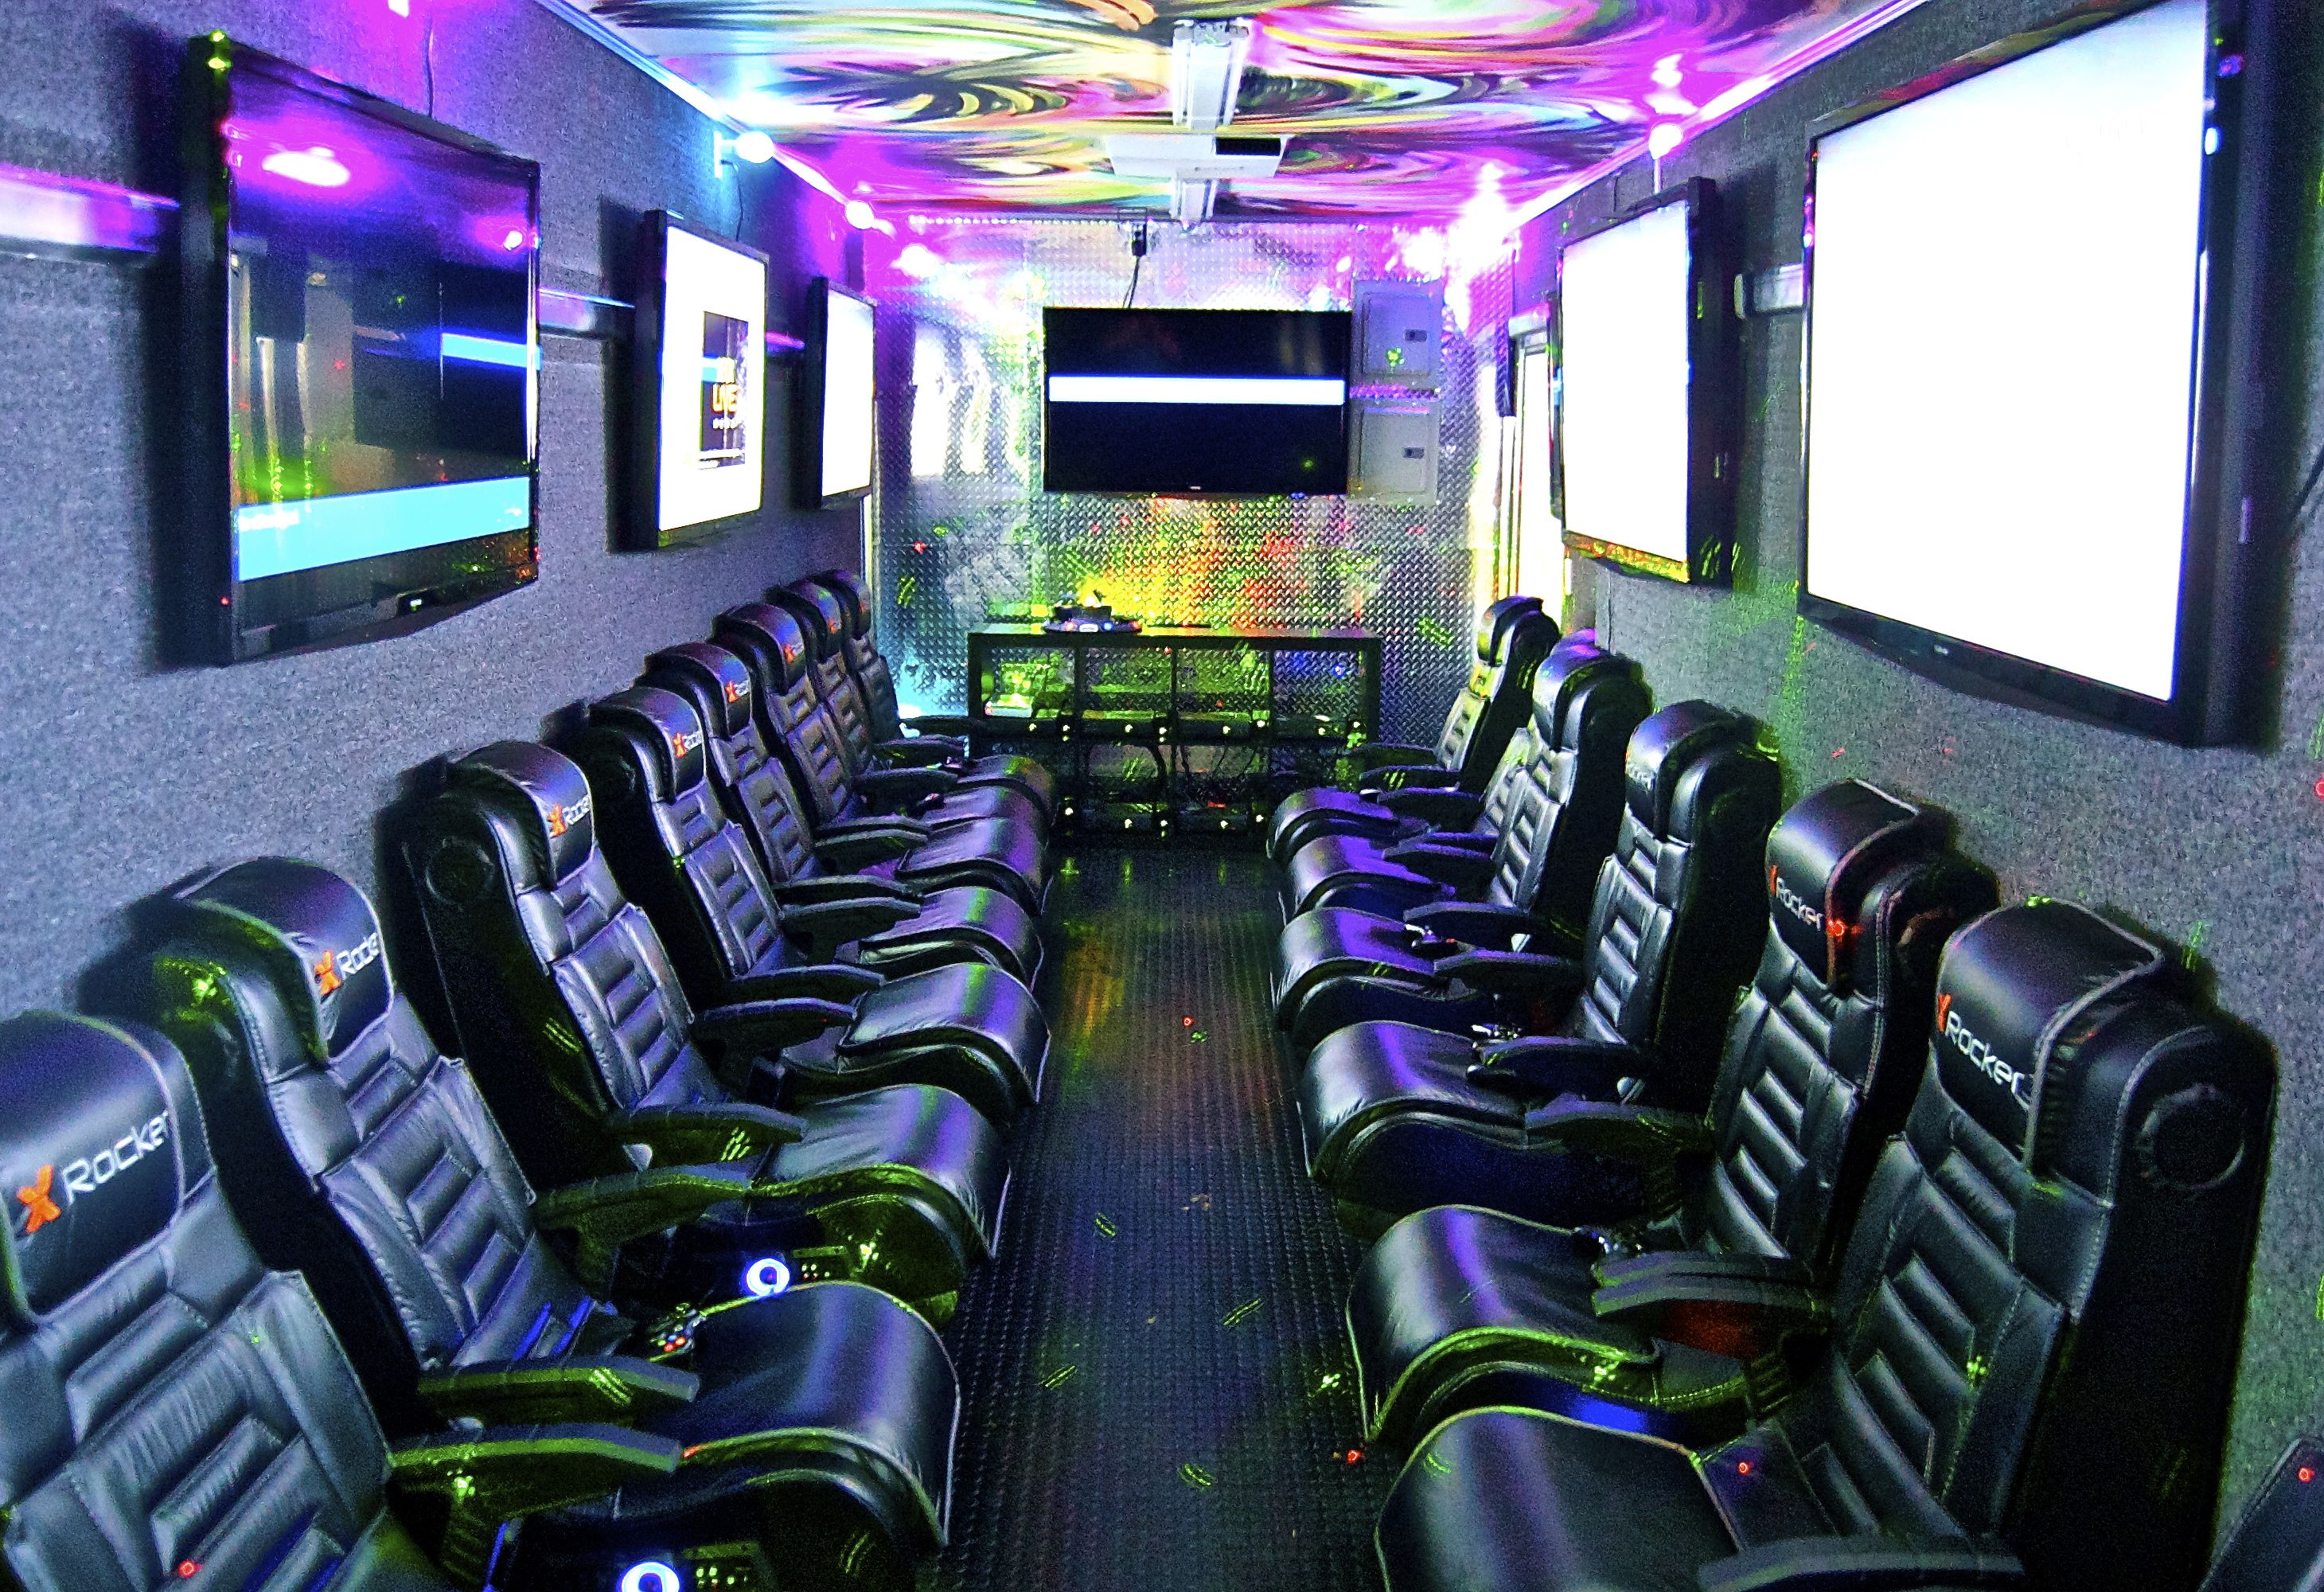 KungPhoo Rockin' Gamin' Parties Video game rooms